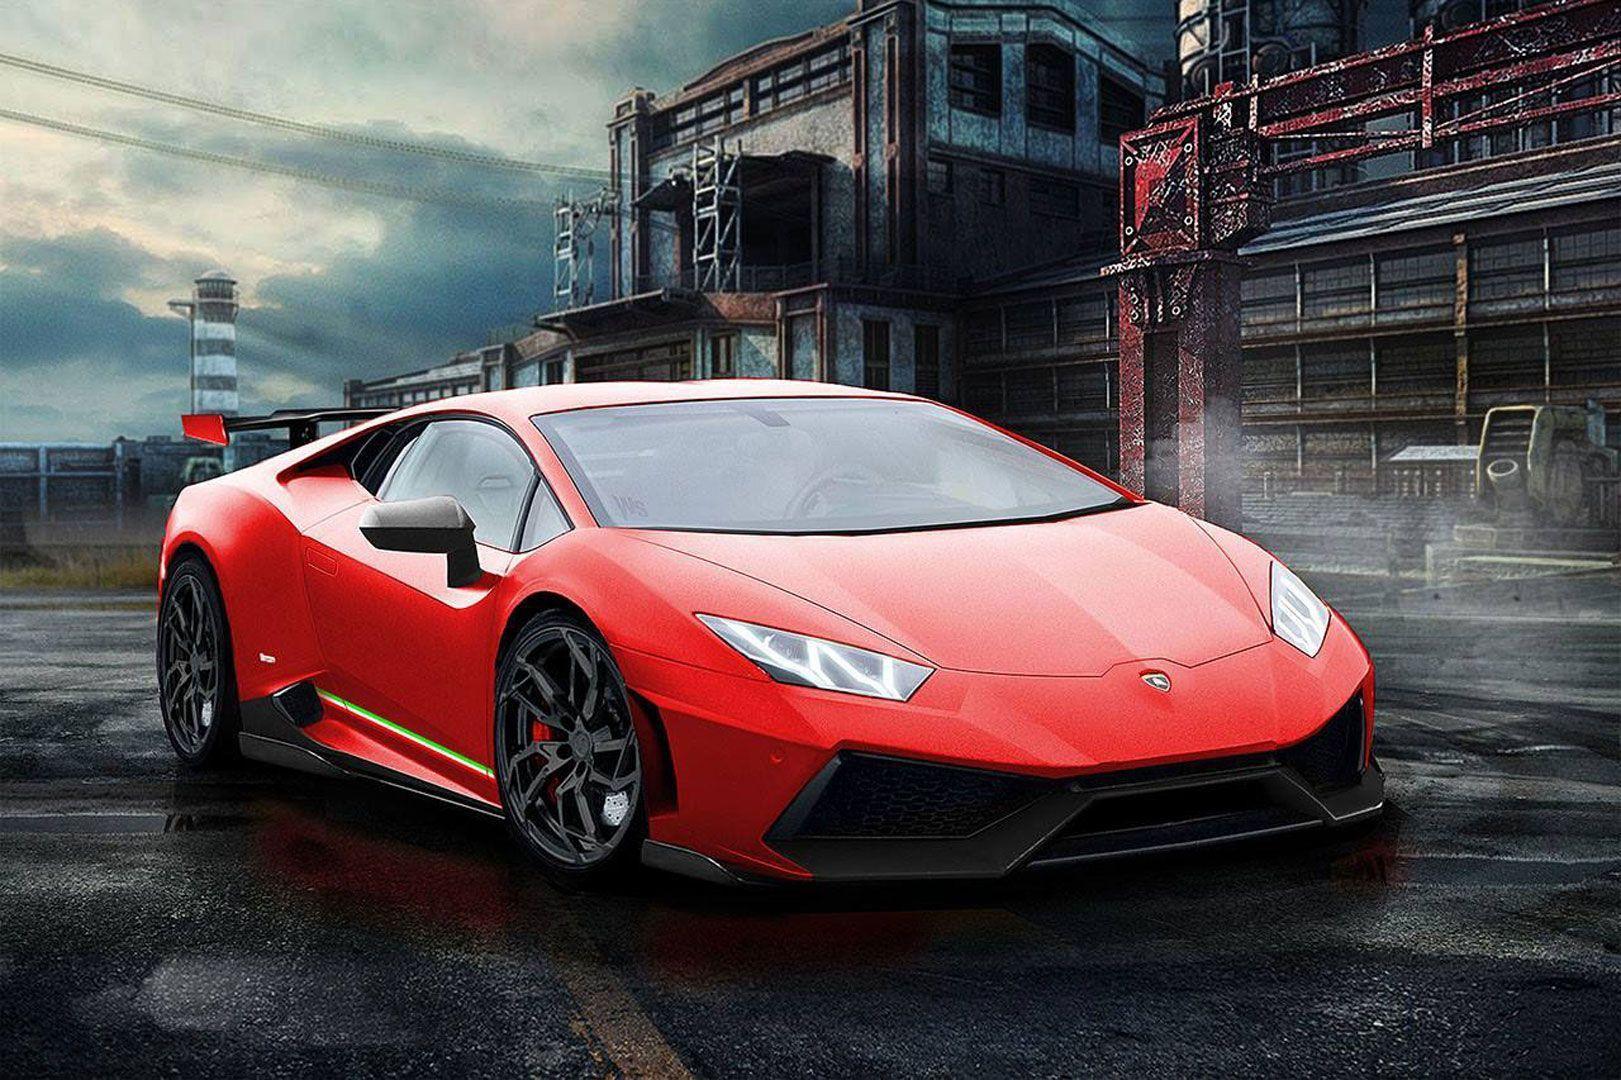 Unduh 73 Wallpaper Android Lamborghini Paling Keren